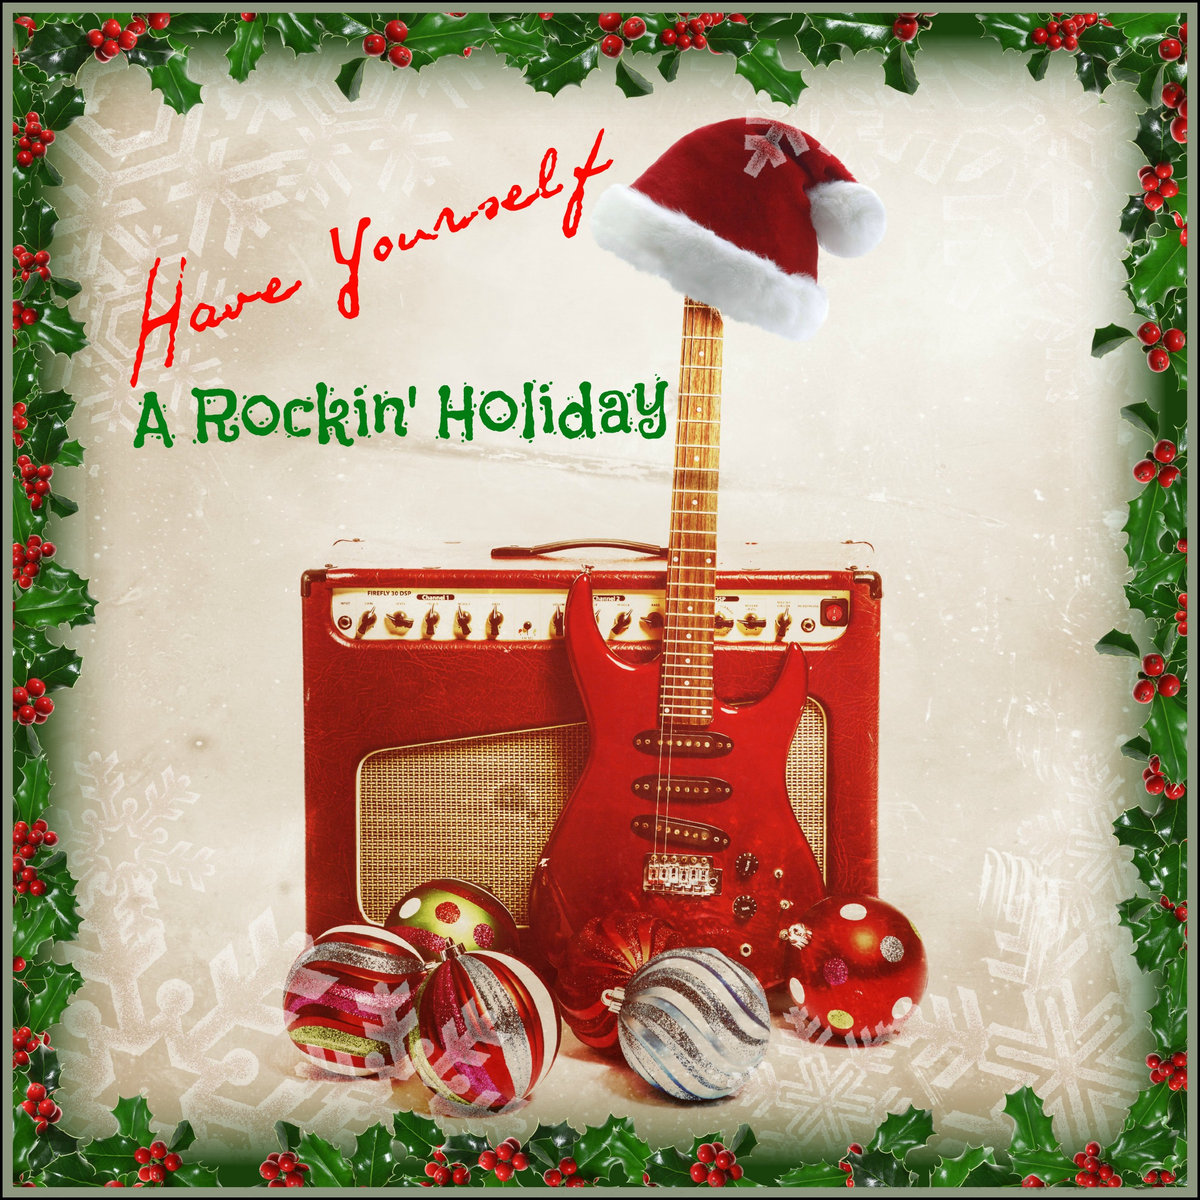 http://willtorock.com/wp-content/uploads/2017/12/Rockin-Christmas.jpg